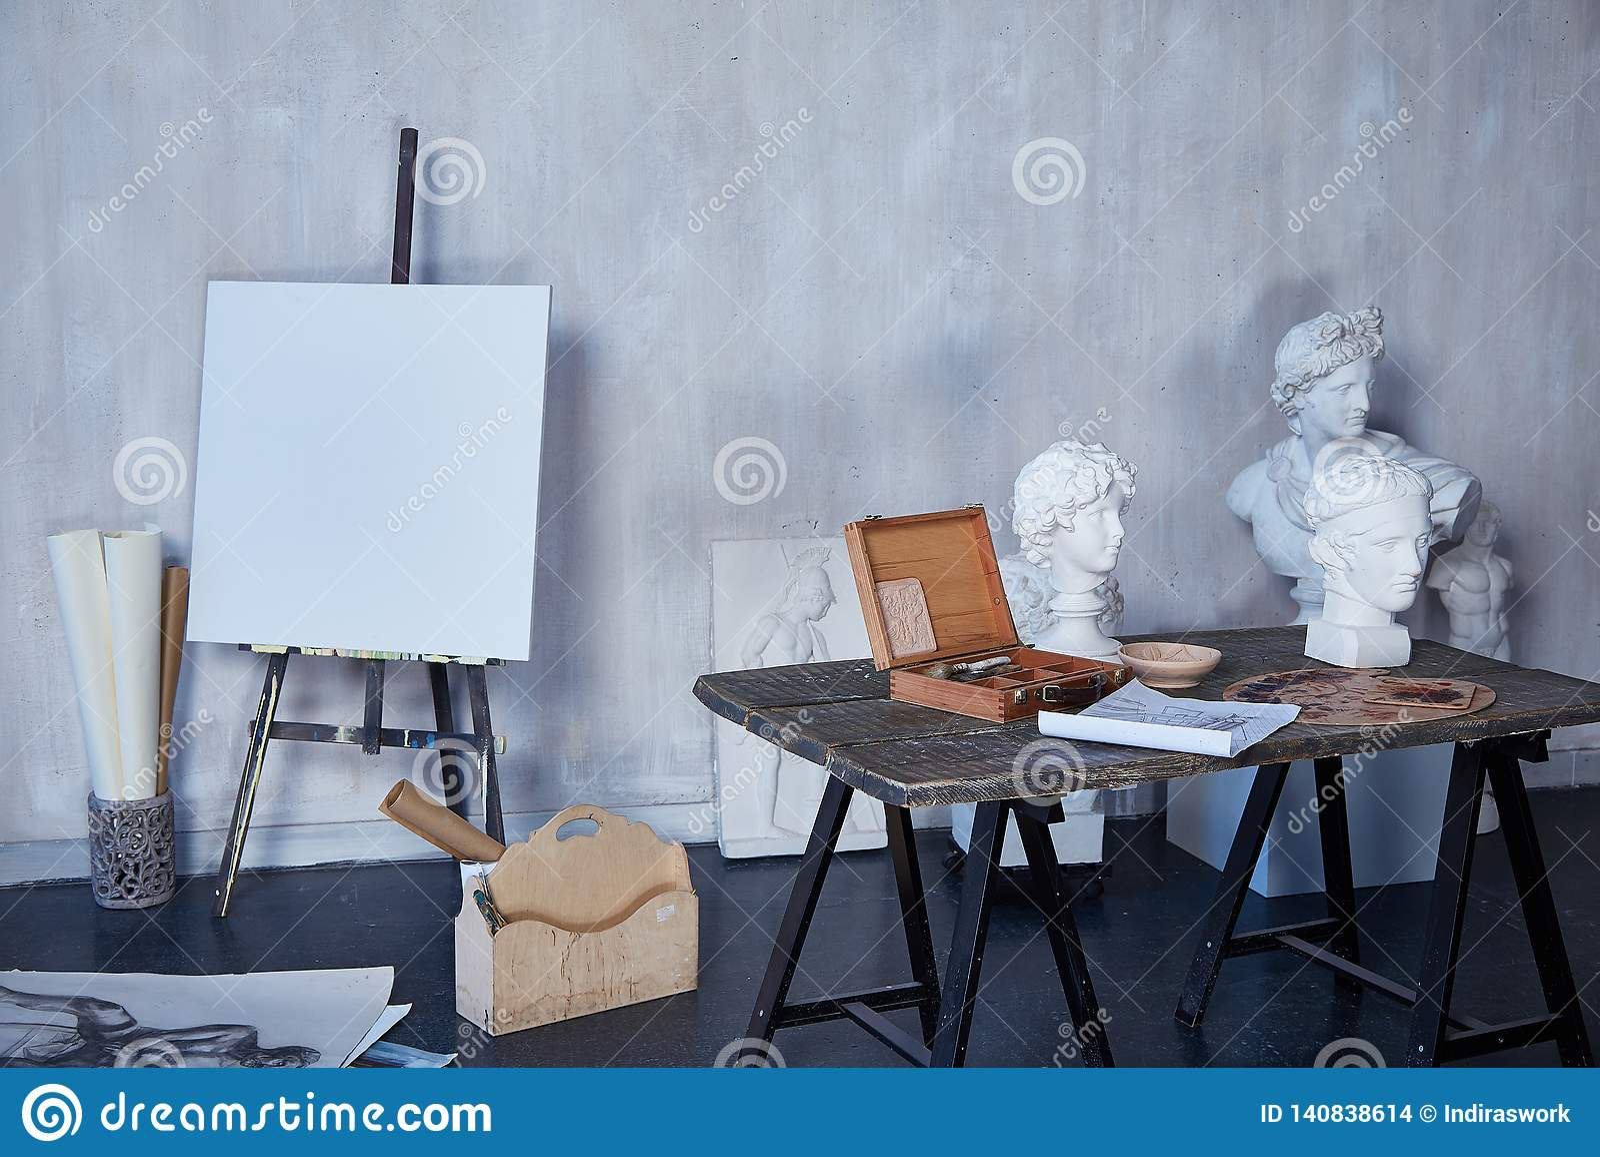 Interior Room Art, Workshop, Artist Painting, Drawing